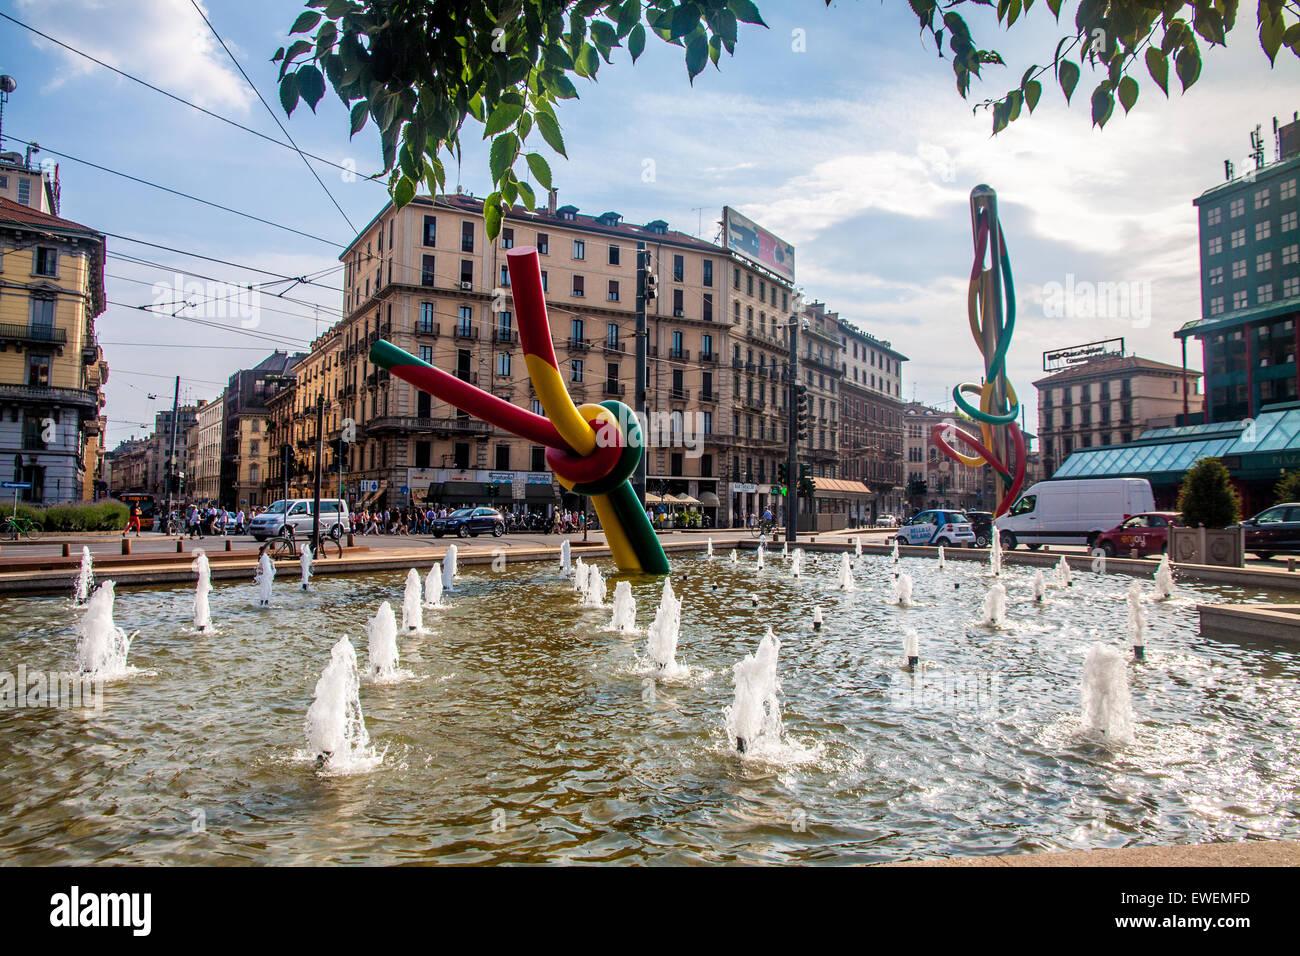 Ago filo nodo, famous sculpture in Milan Stock Photo